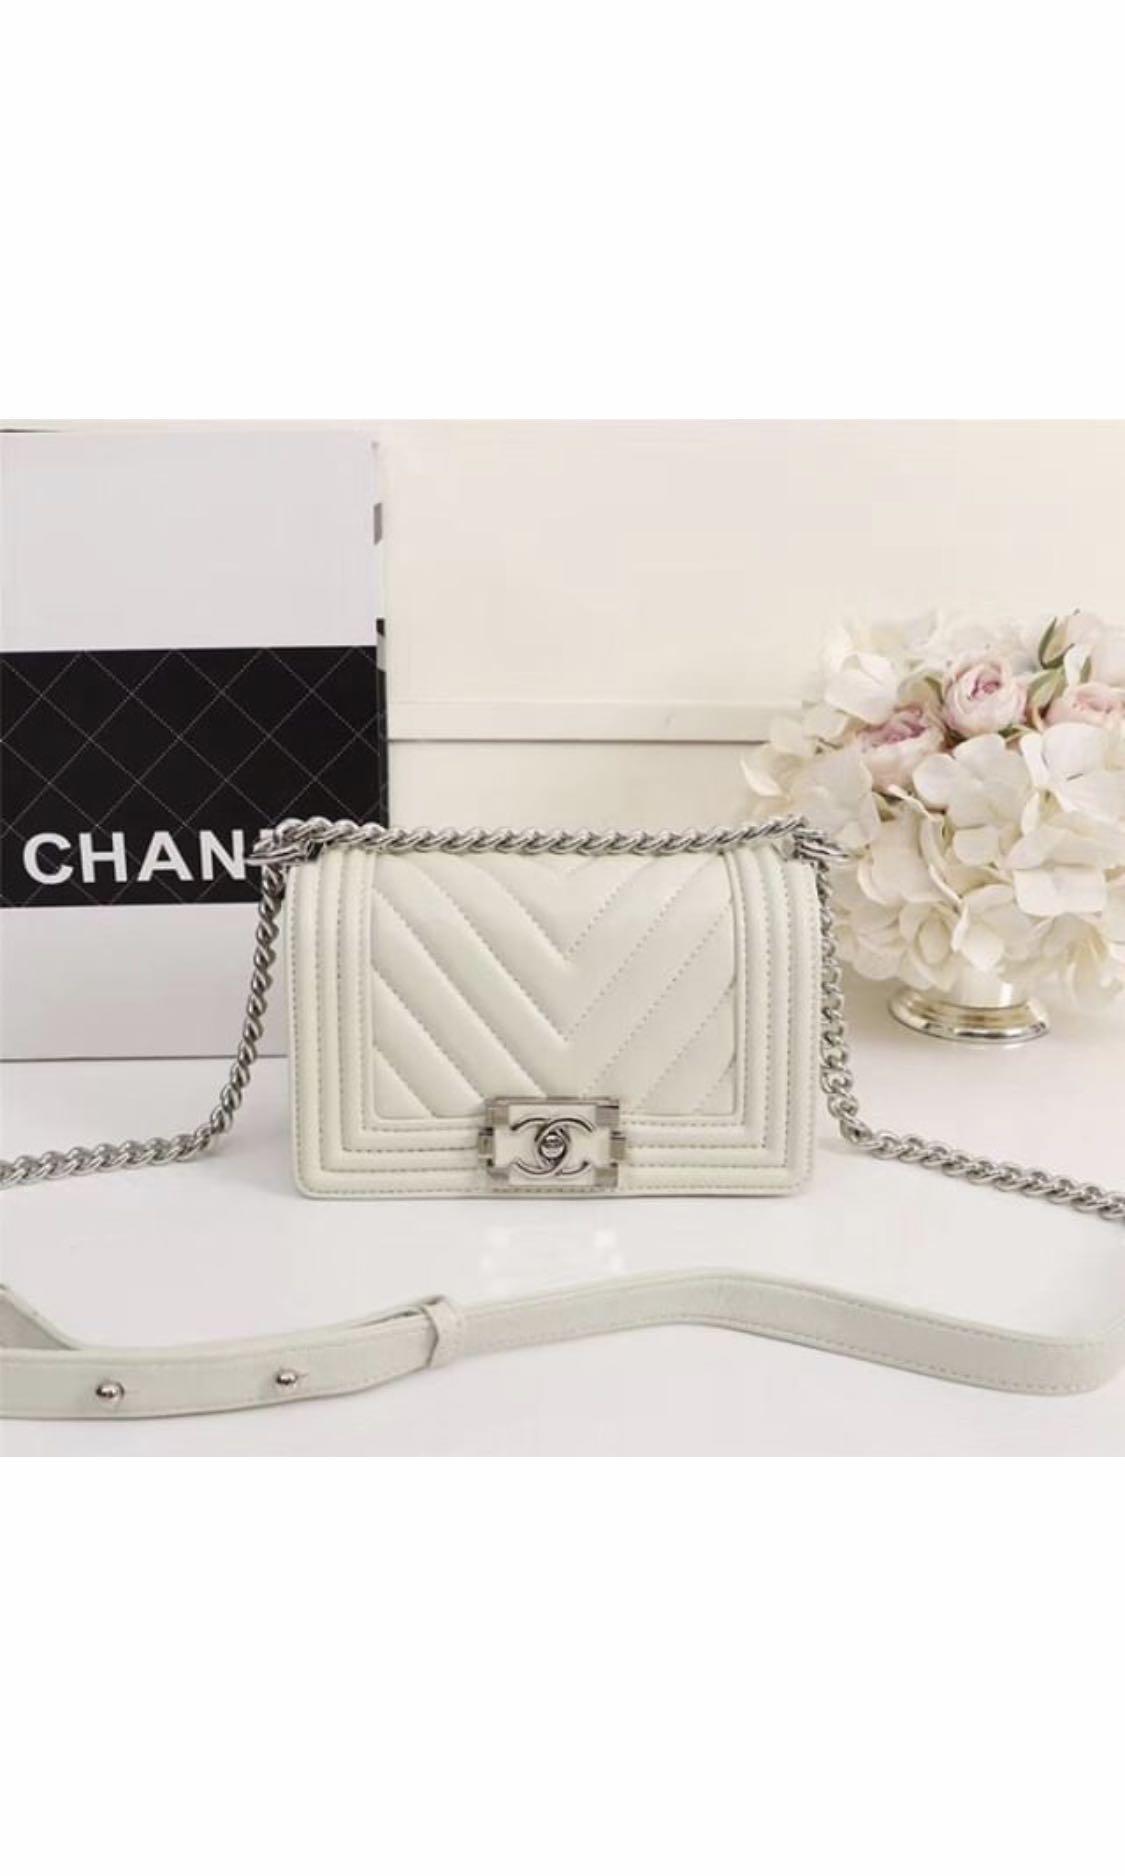 1bb13810a523 BN boy sling handbag, Luxury, Bags & Wallets, Handbags on Carousell